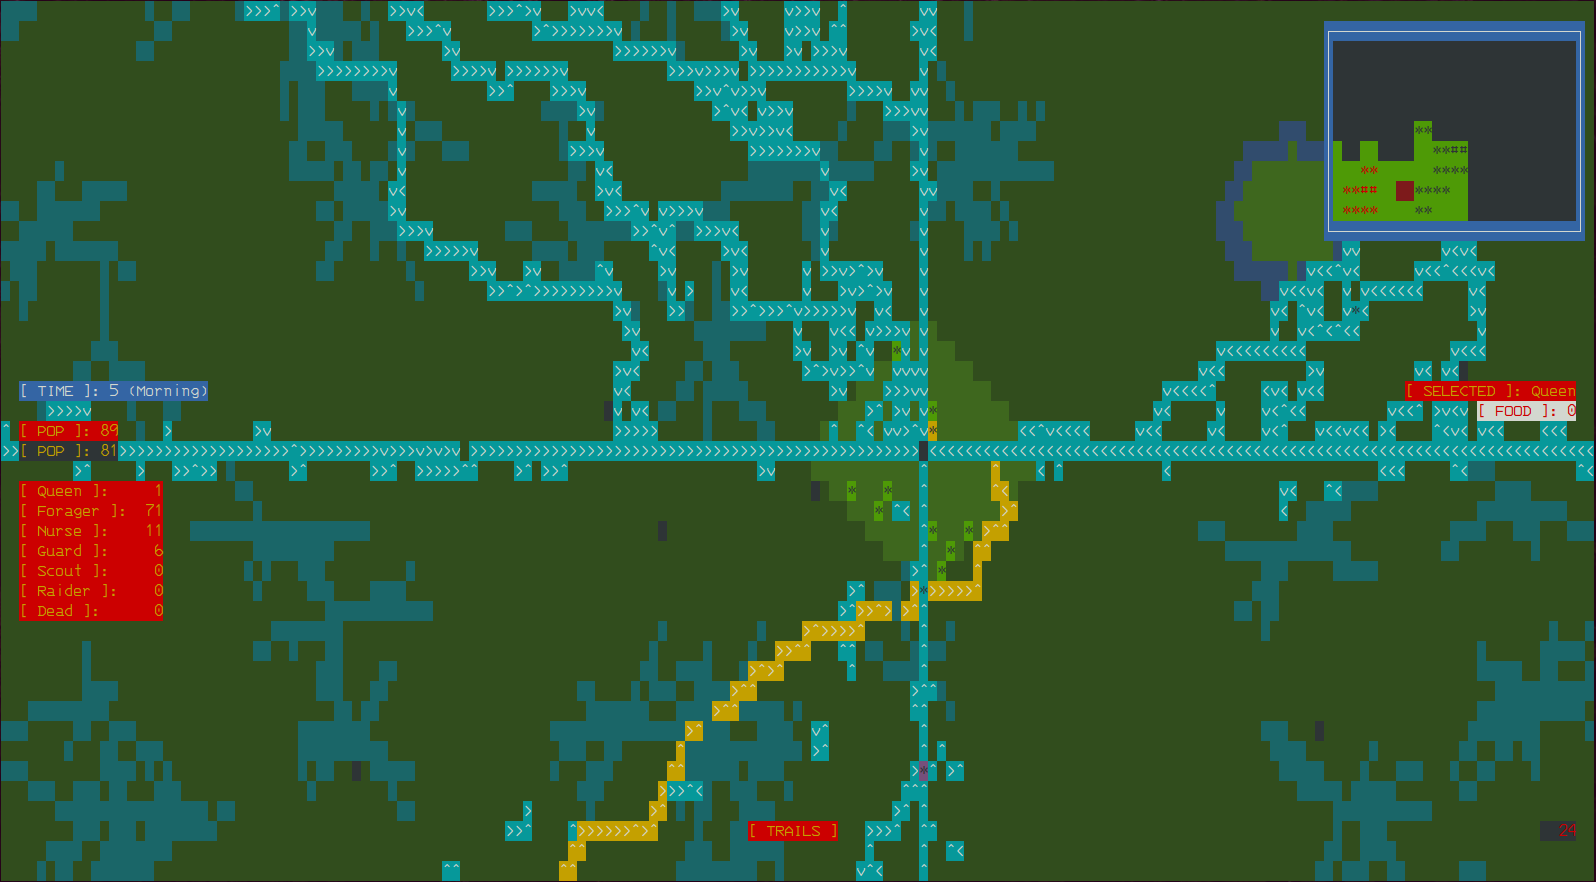 gameplay screenshot with ASCII art graphics